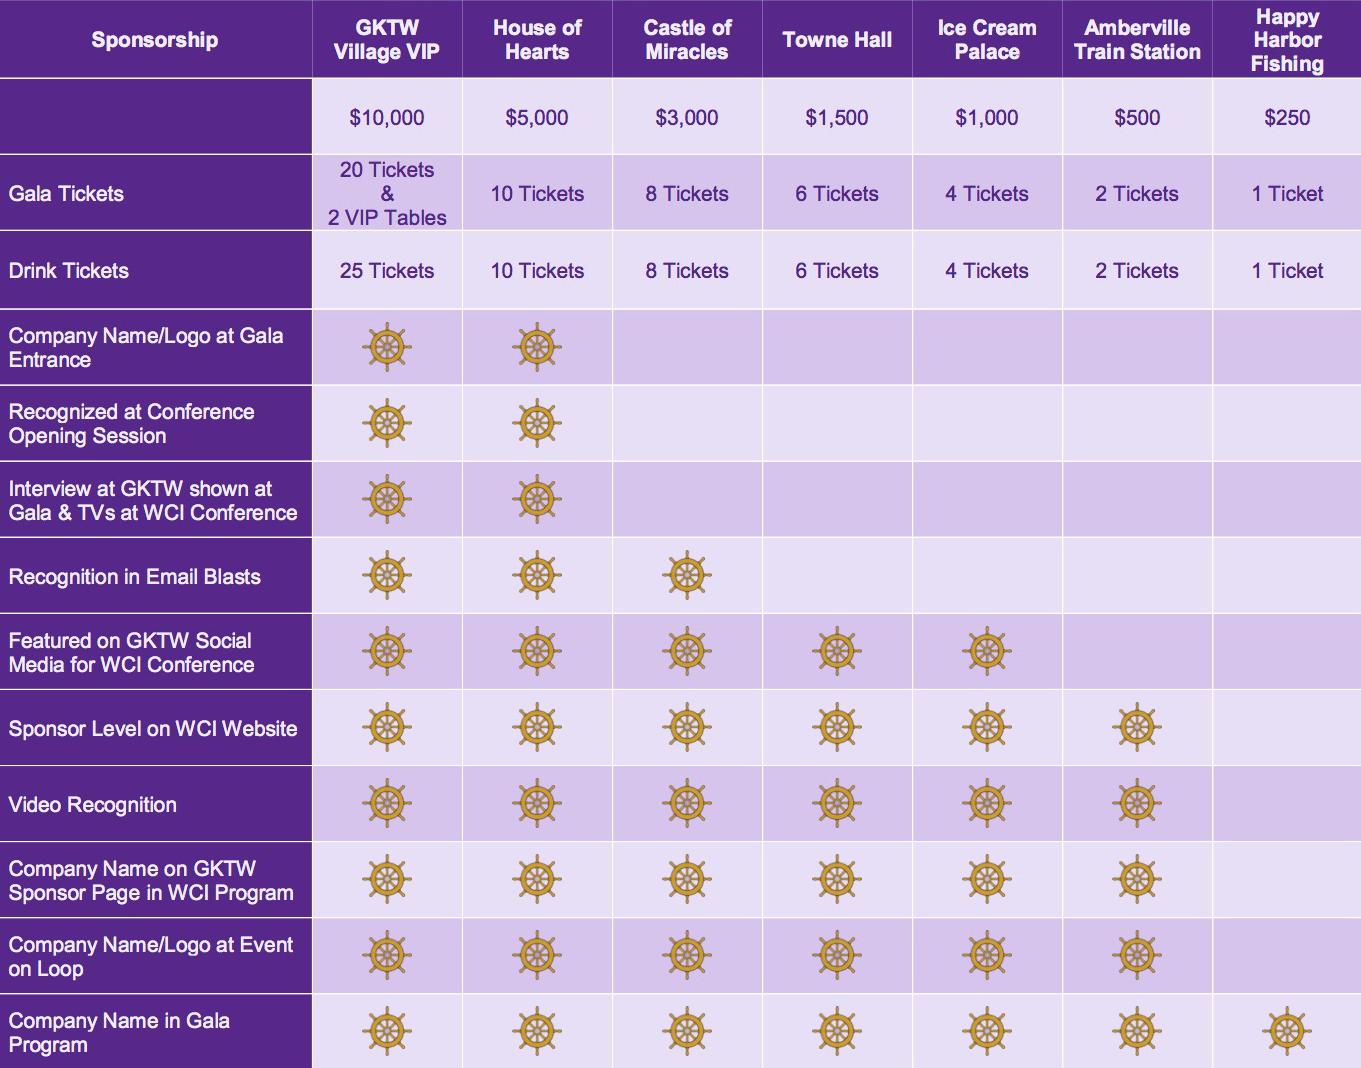 Sponsorship WCI GKTW Chart